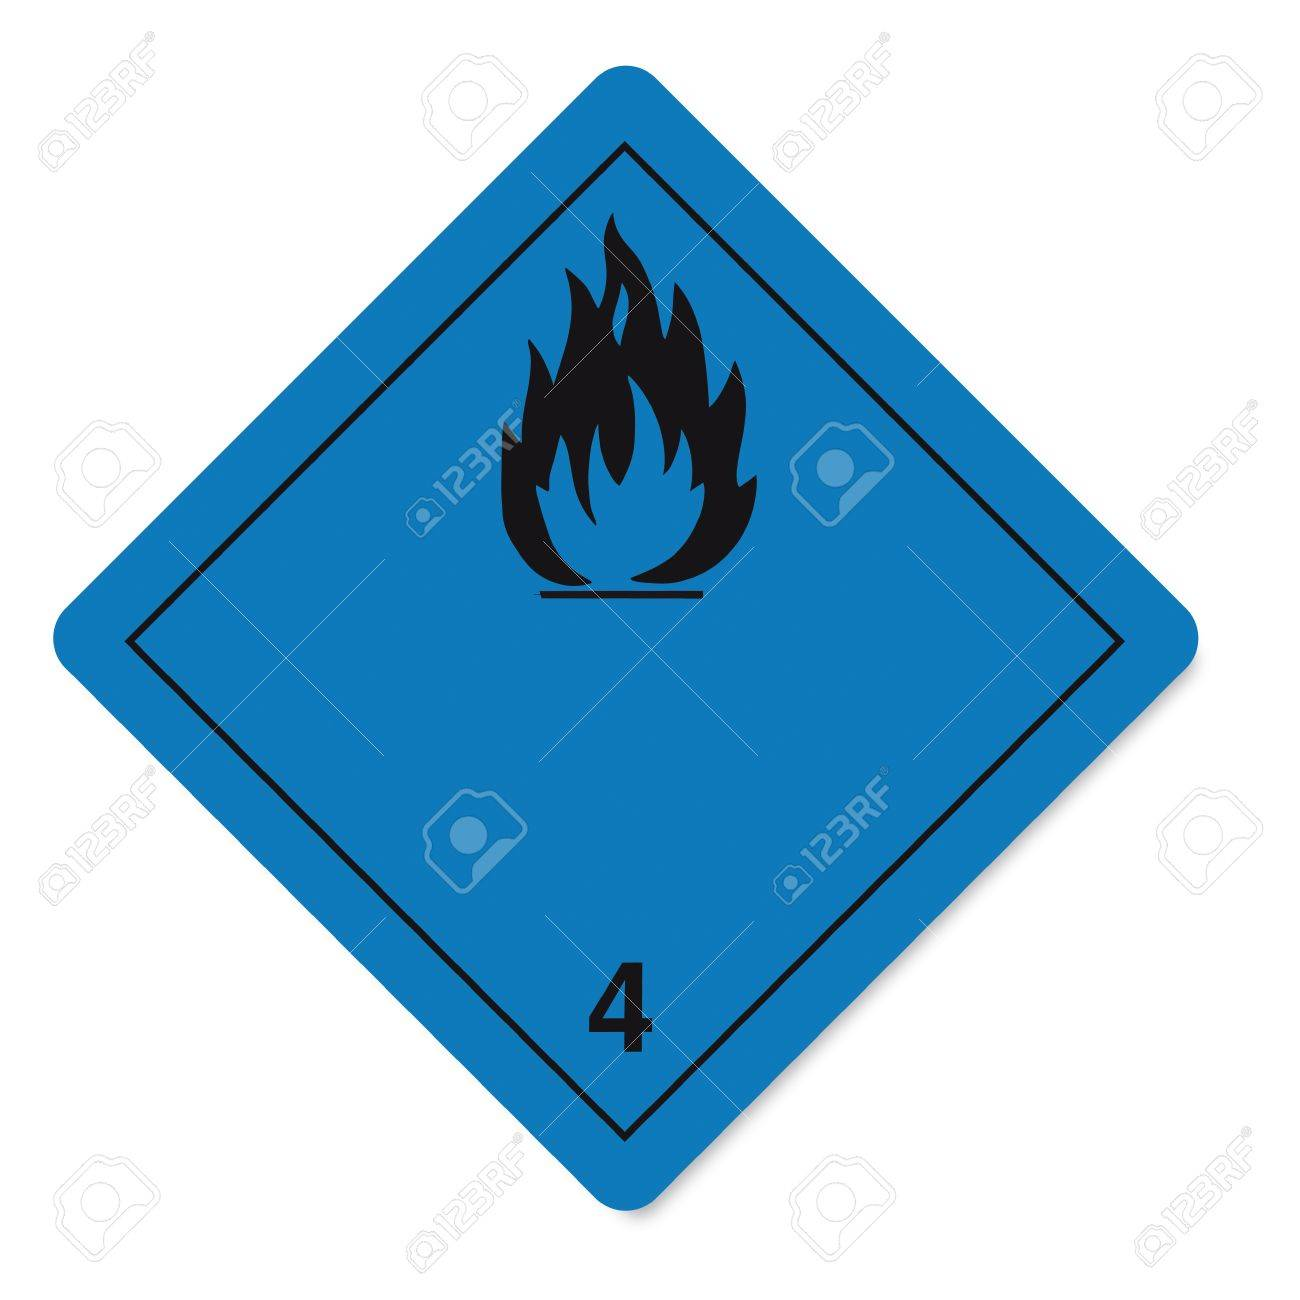 Hazardous substances signs icon flammable skull radioactive fire Stock Vector - 14380149